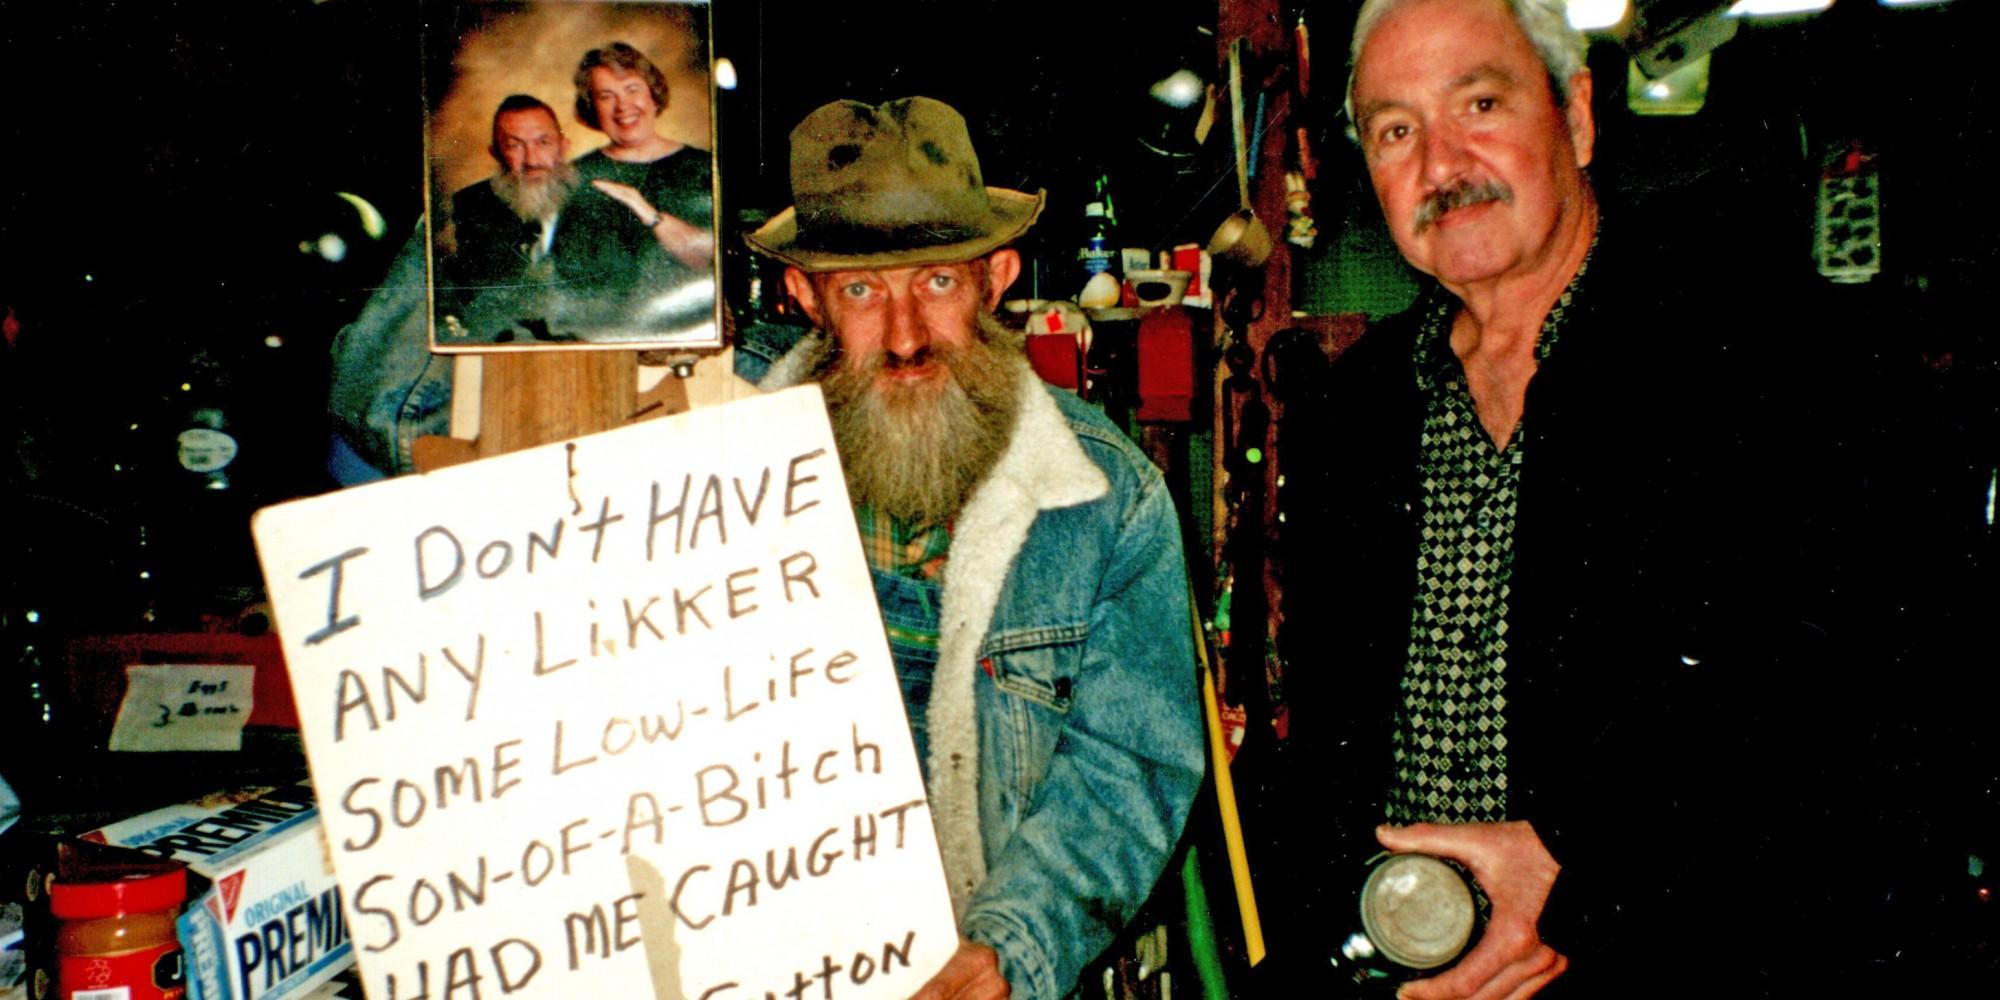 POPCORN SUTTON'S LAST STILL – 2002